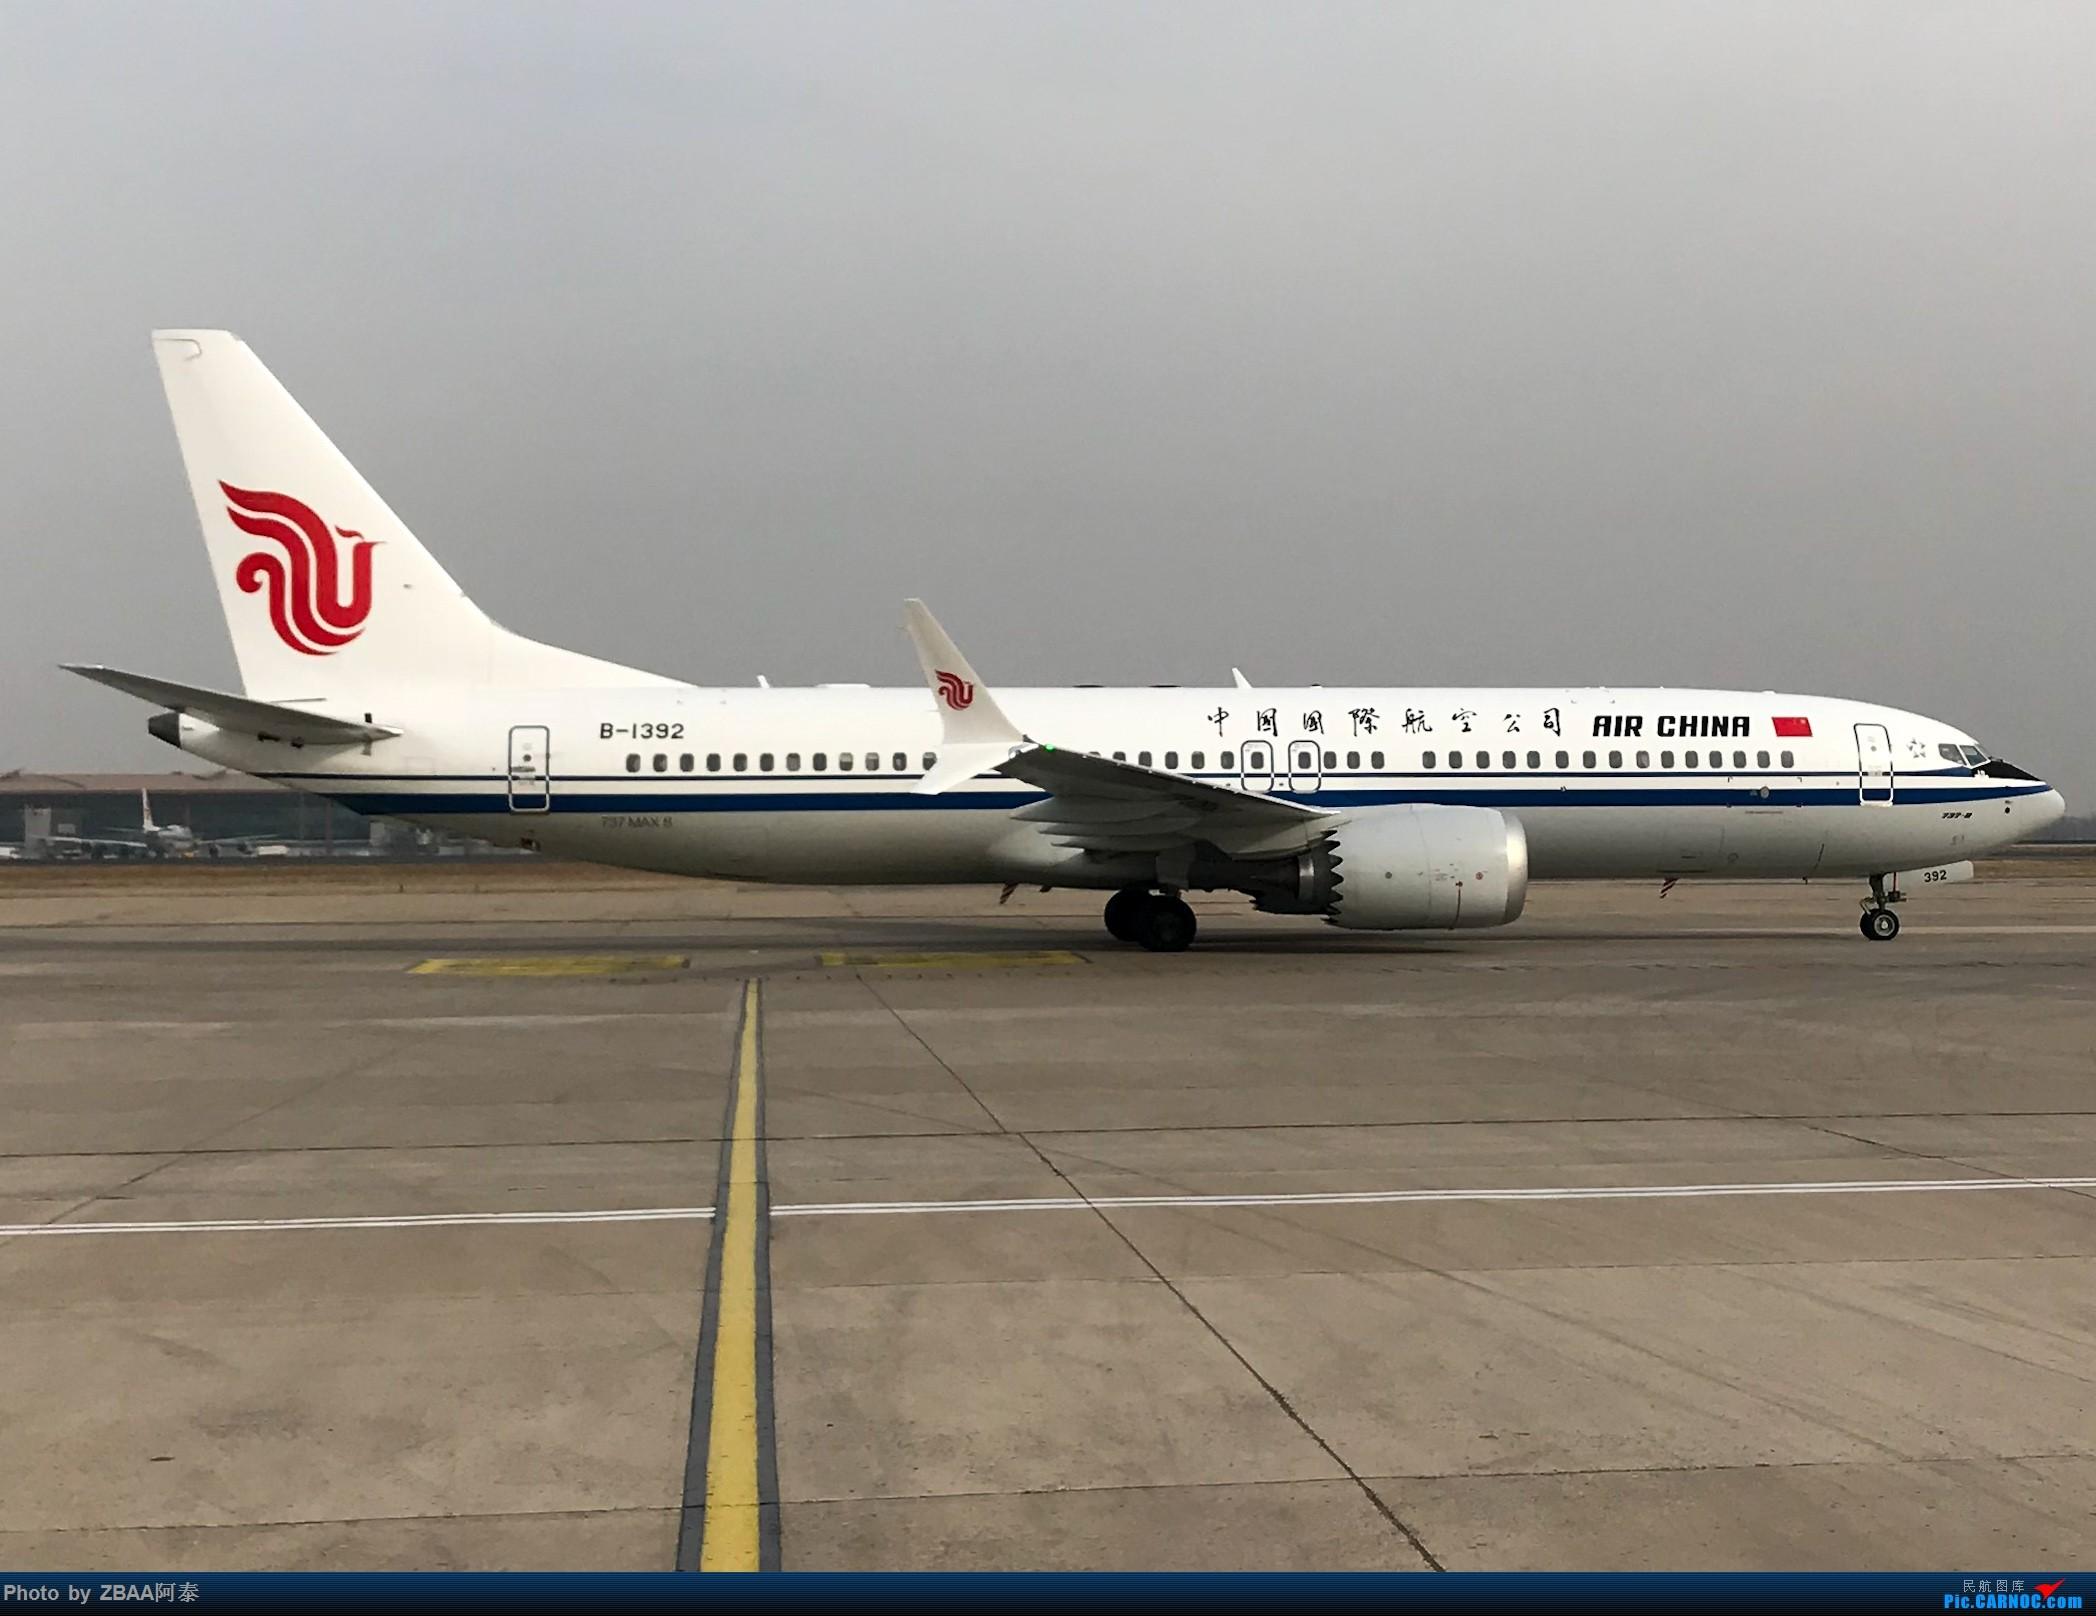 [原创]737MAX BOEING 737MAX-8 B-1392 中国北京首都国际机场